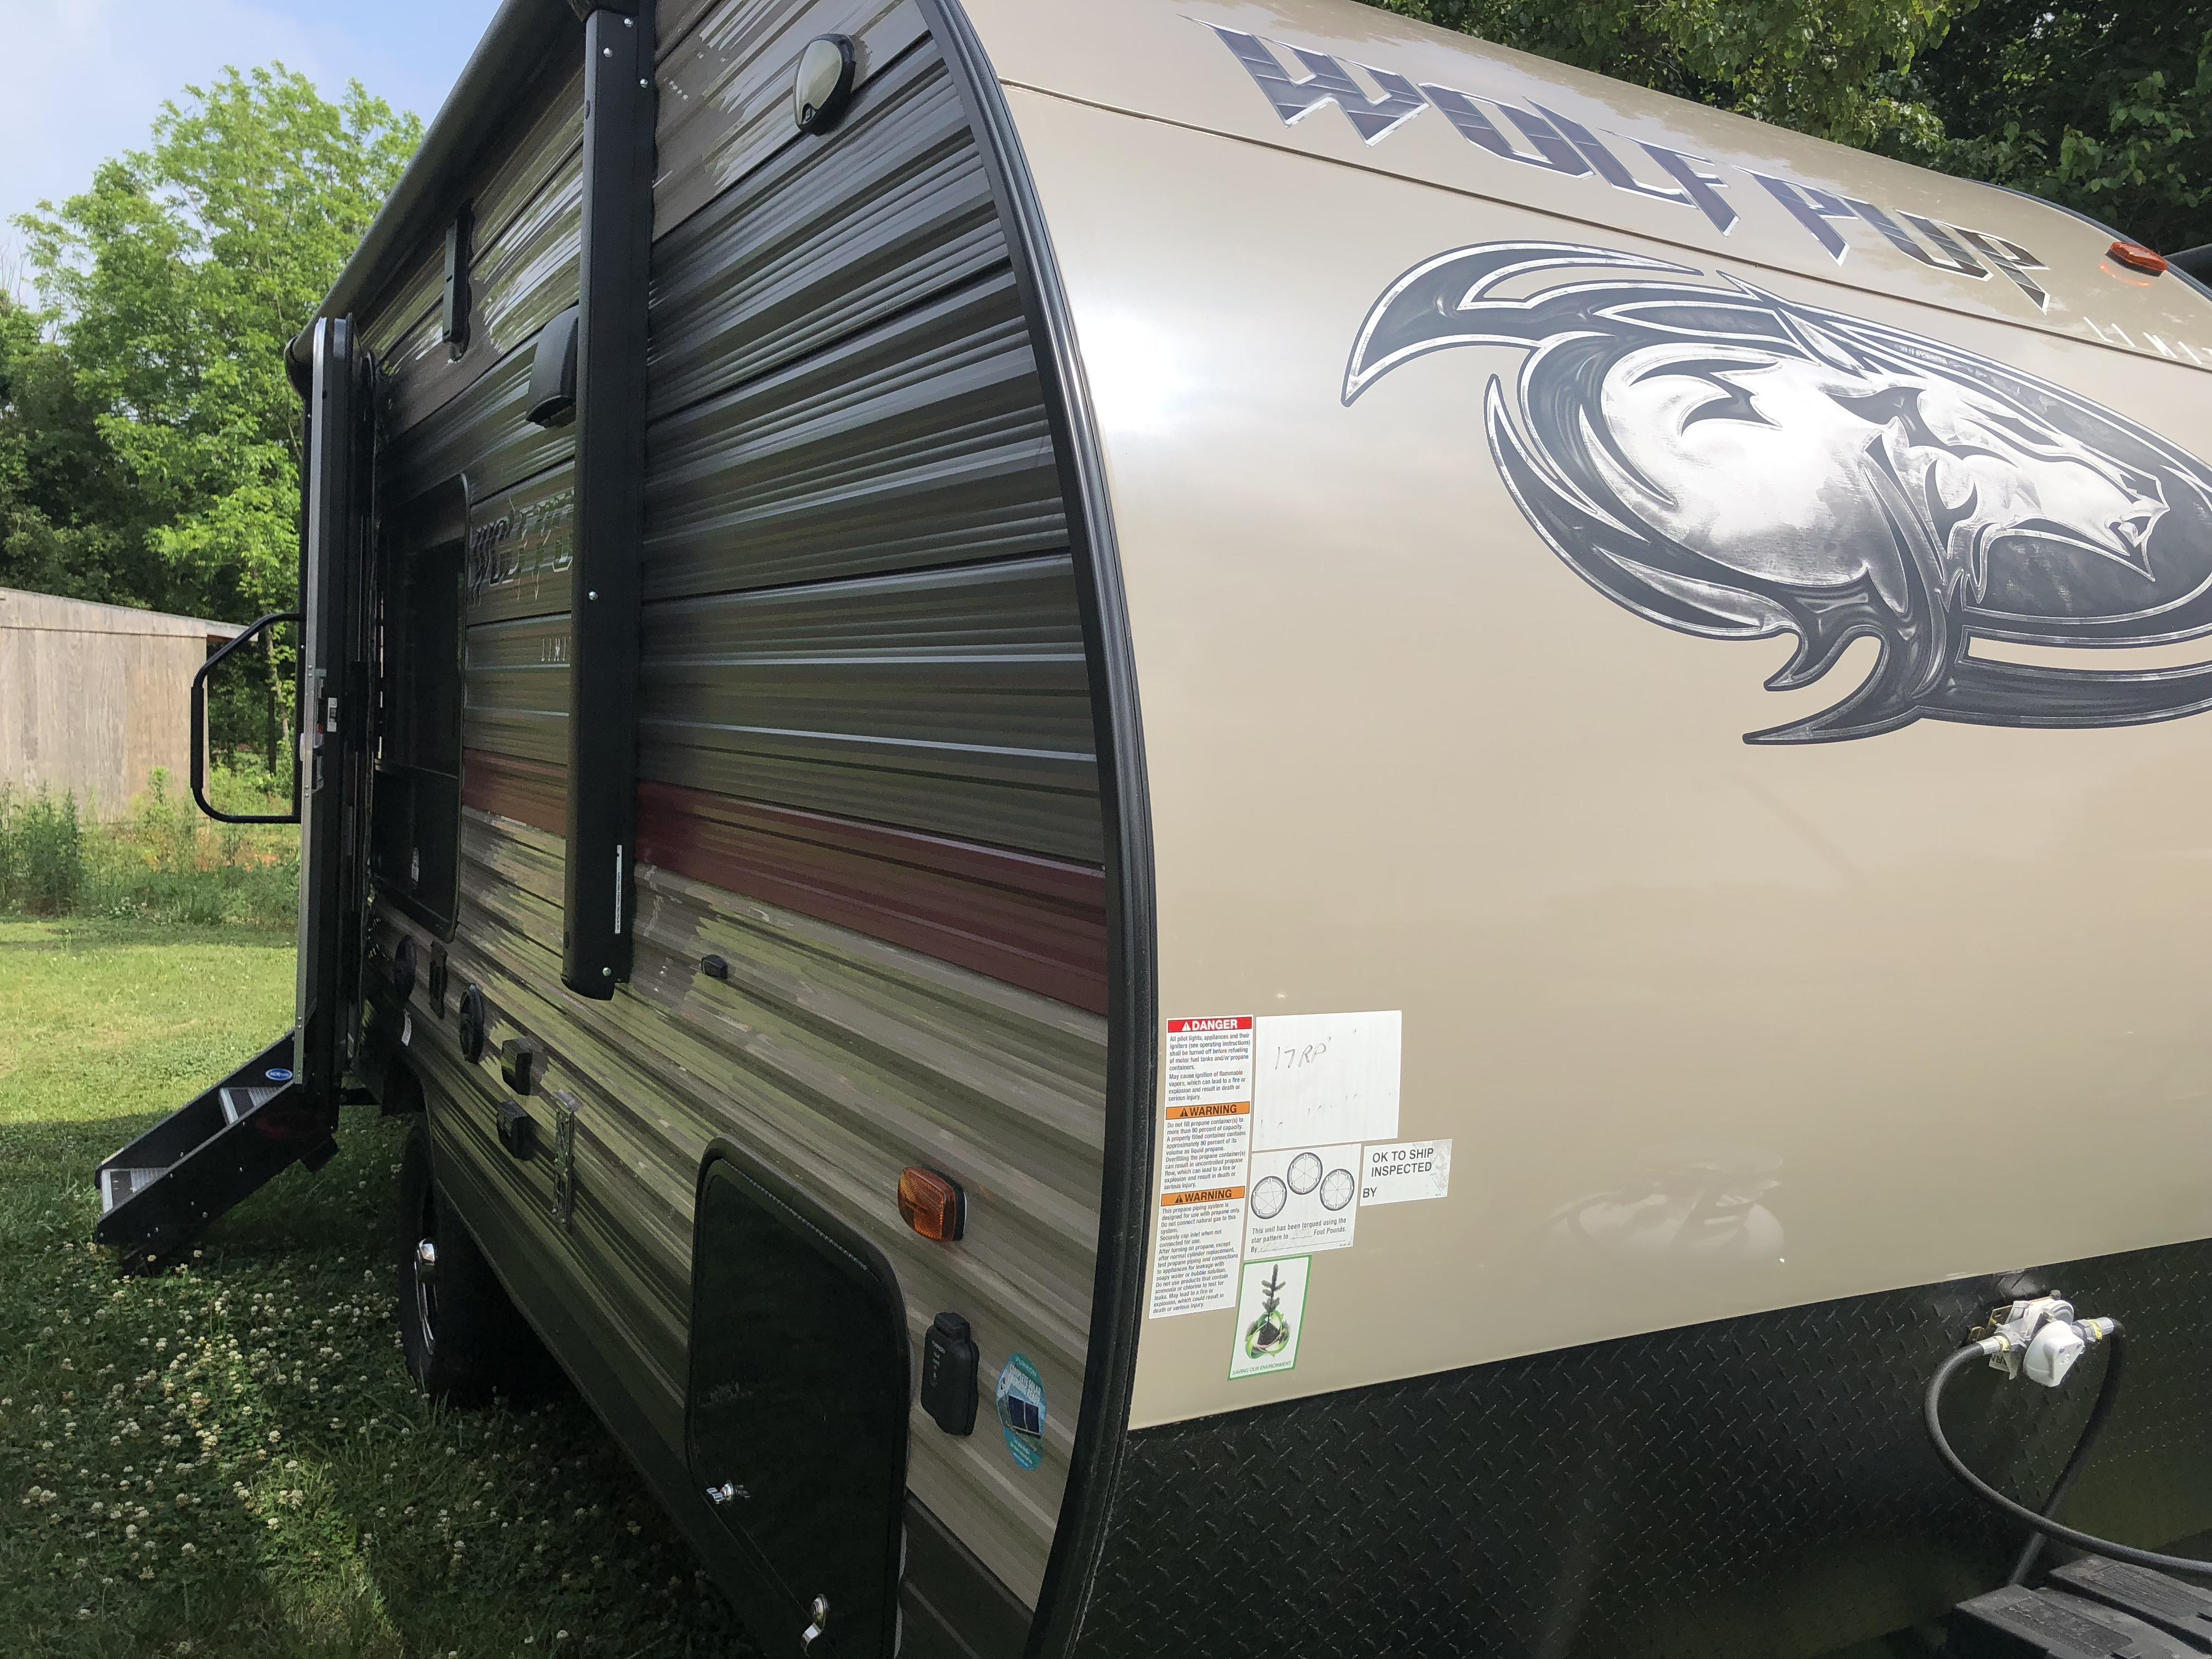 Texas motor speedway camping hookups vapors